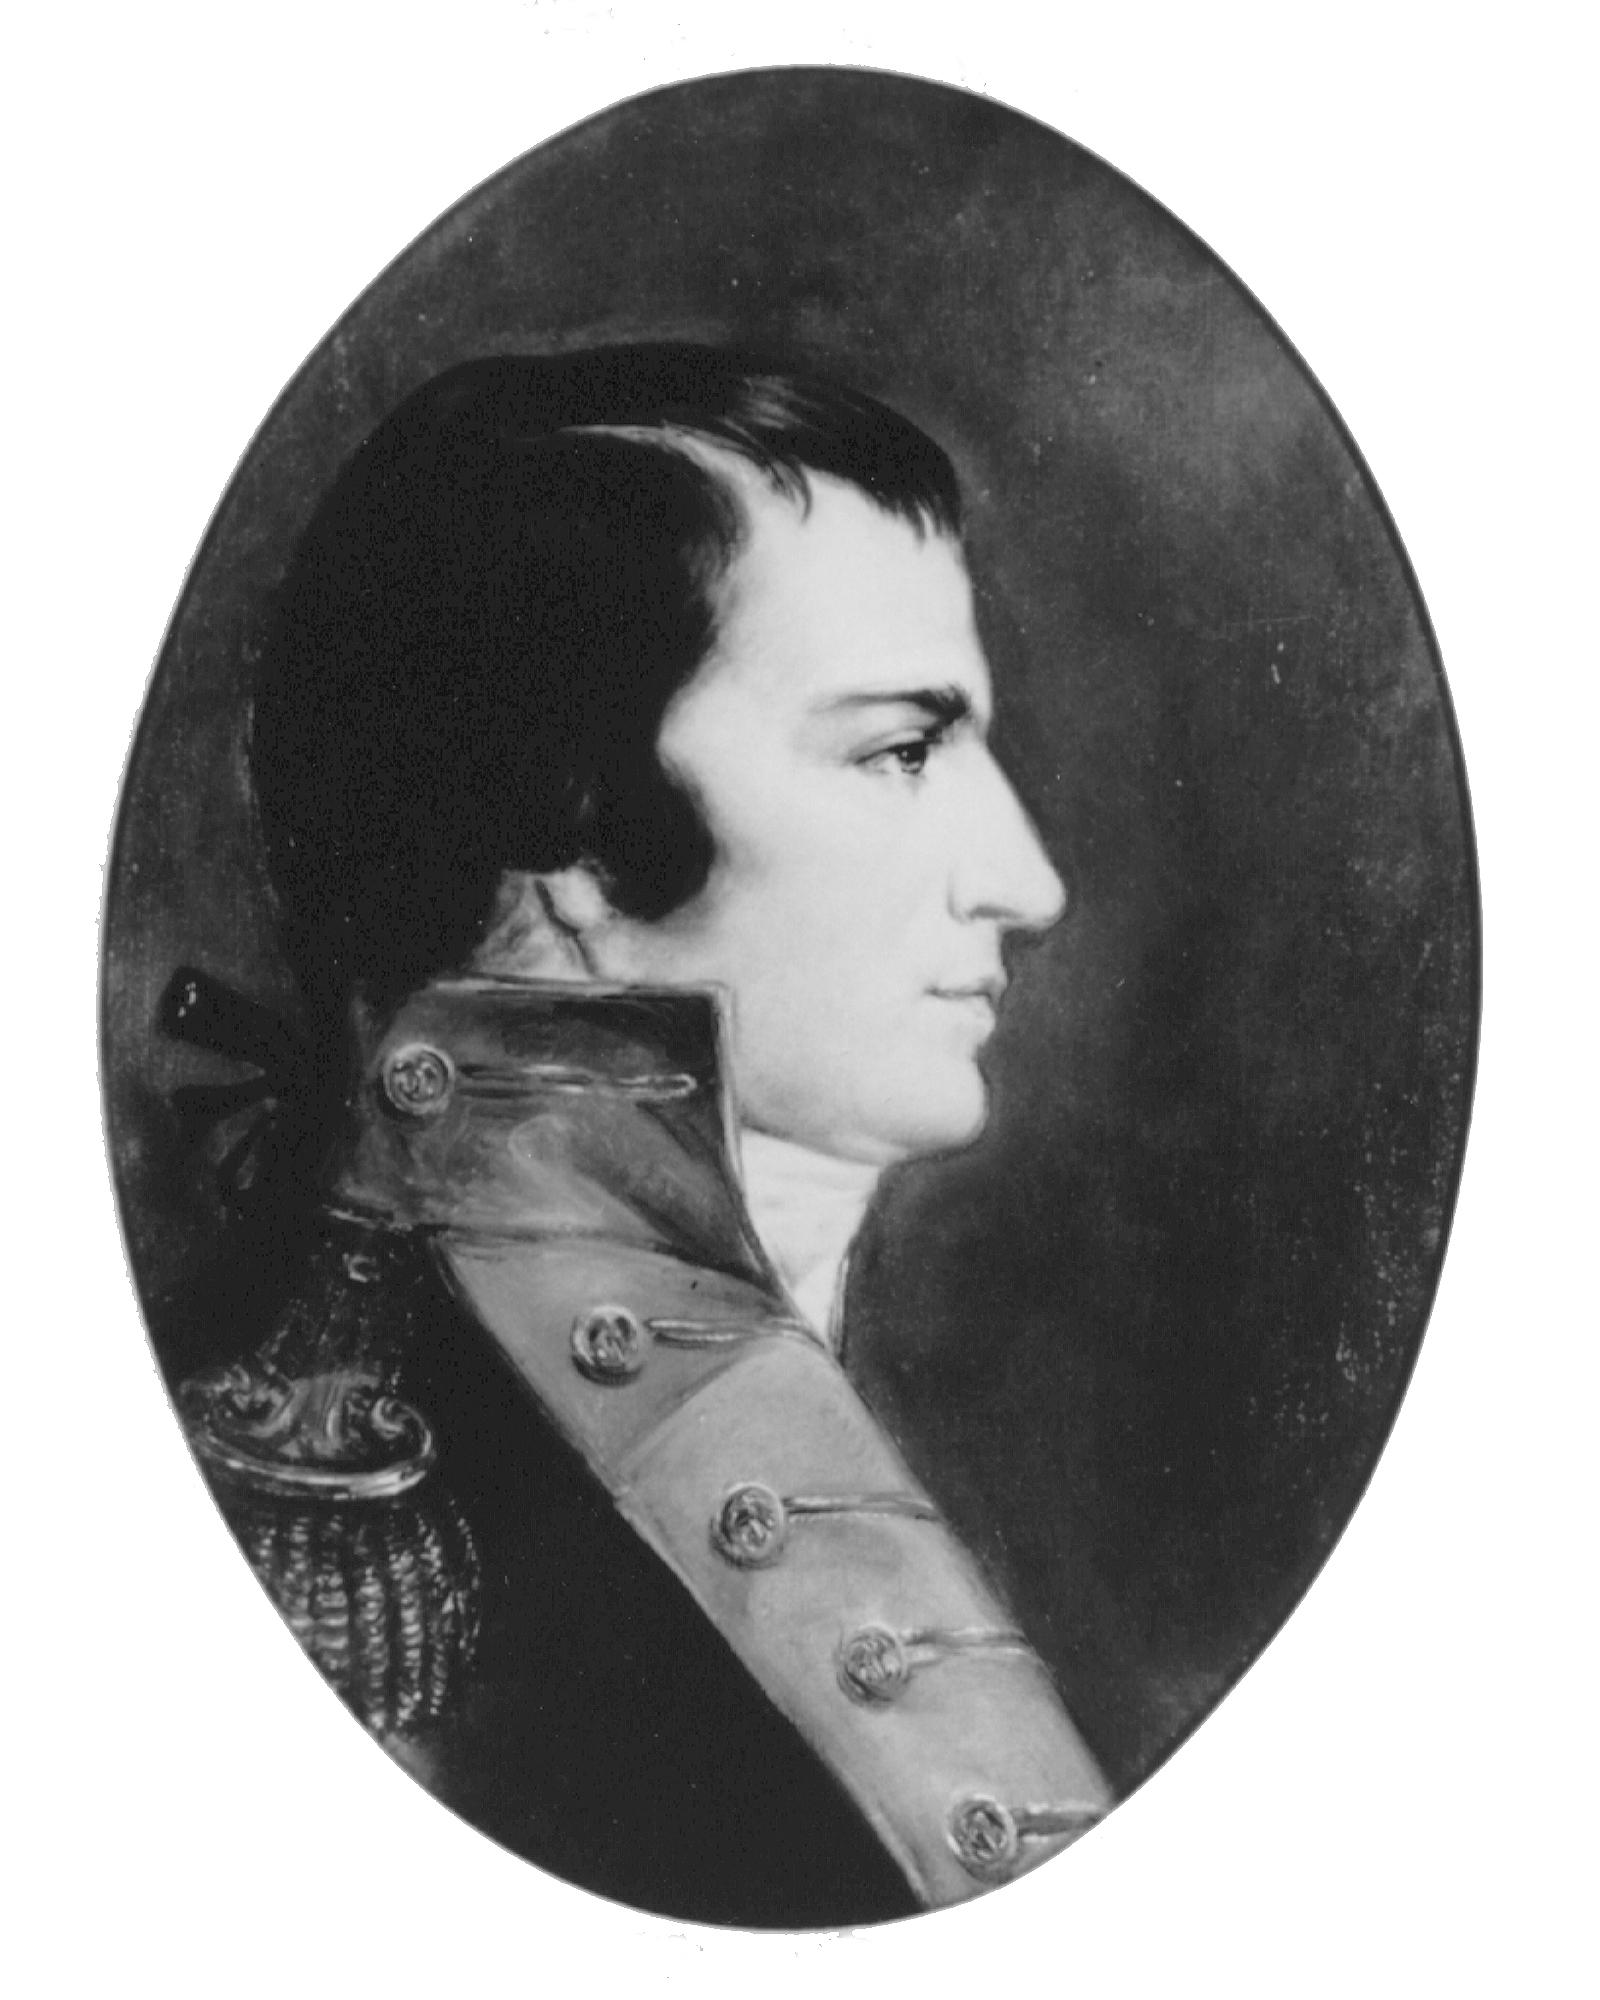 black & white portrait of William W. Burrows